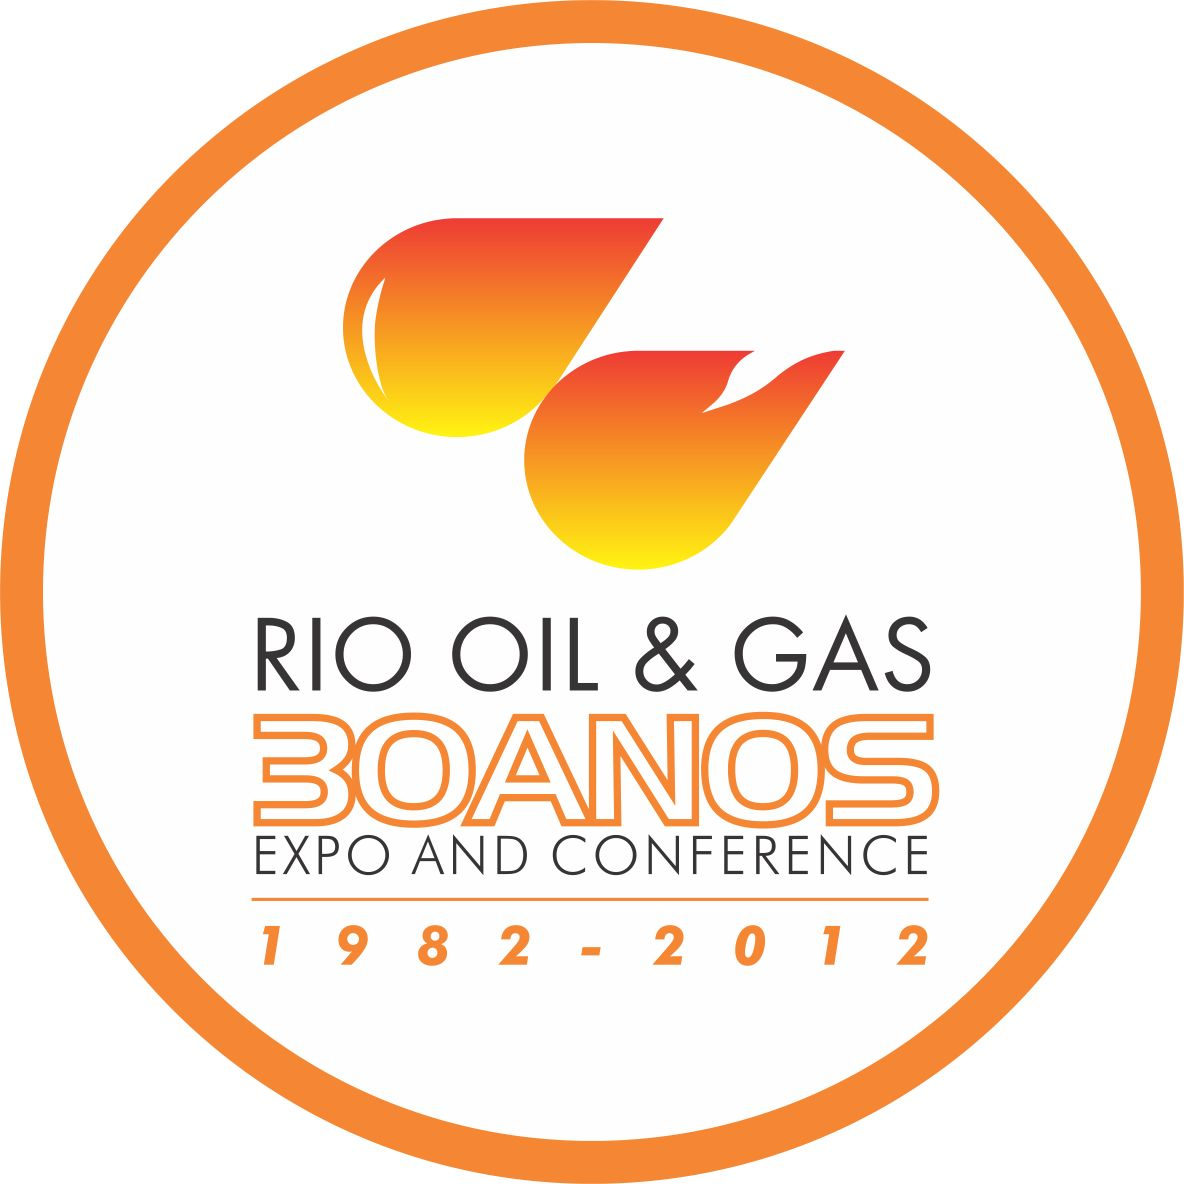 logo_ROG_30anos_RGB1